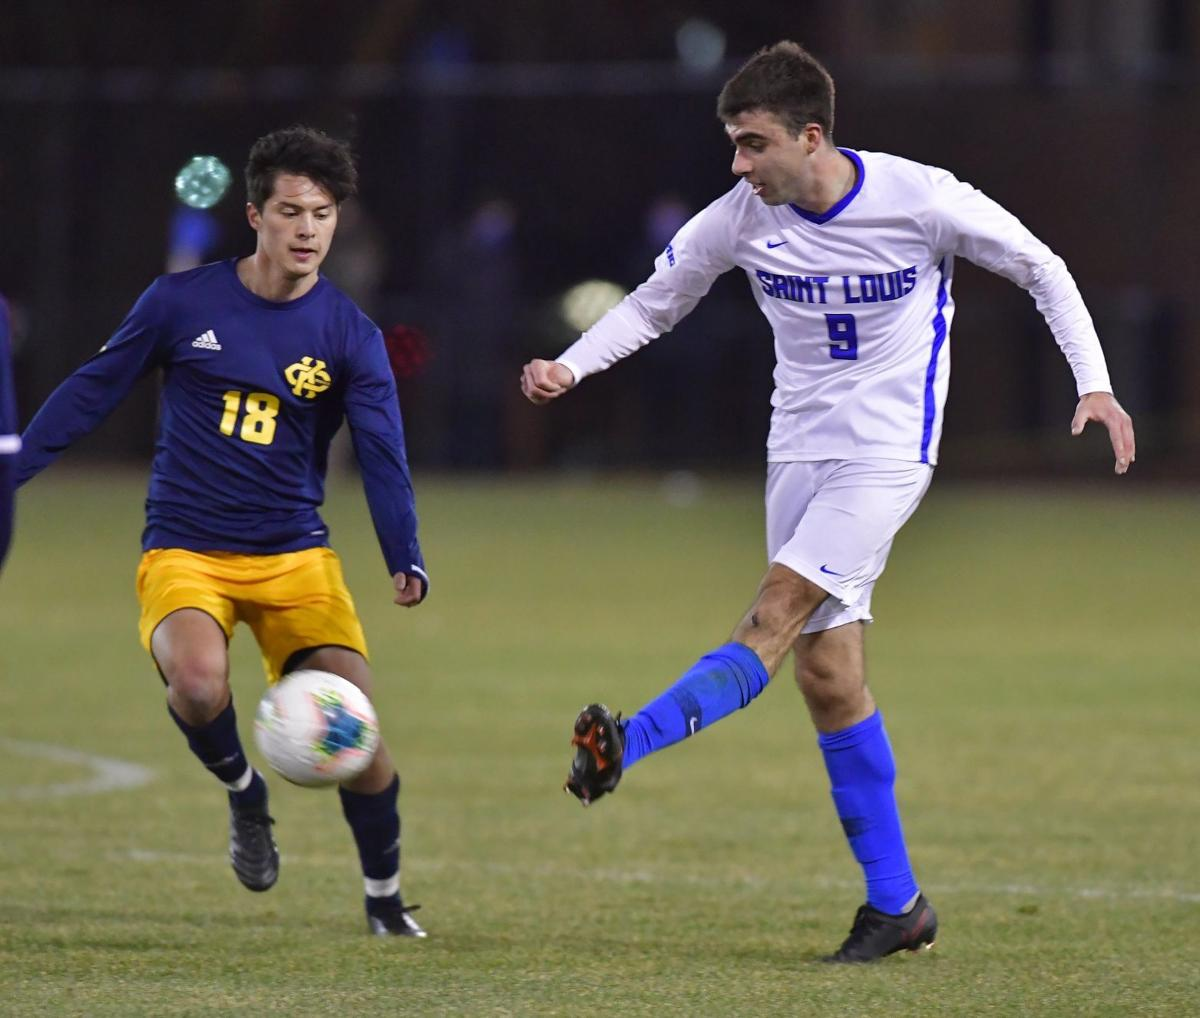 SLU vs UMKC Mens Soccer